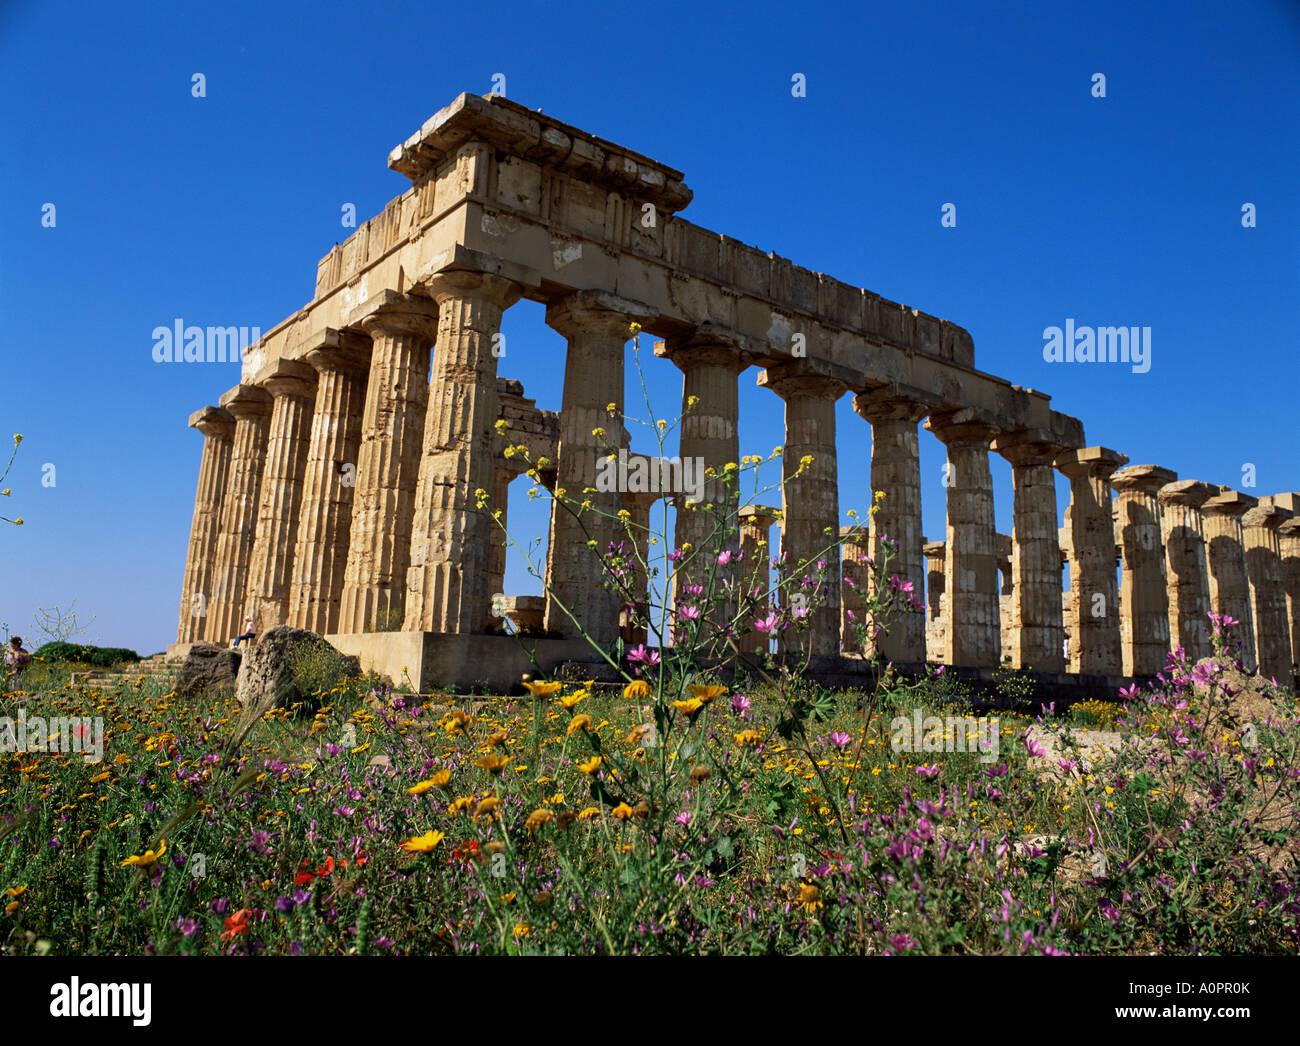 Temple E dating from 5th century BC Selinunte near Castelventrano Sicily Italy Europe - Stock Image